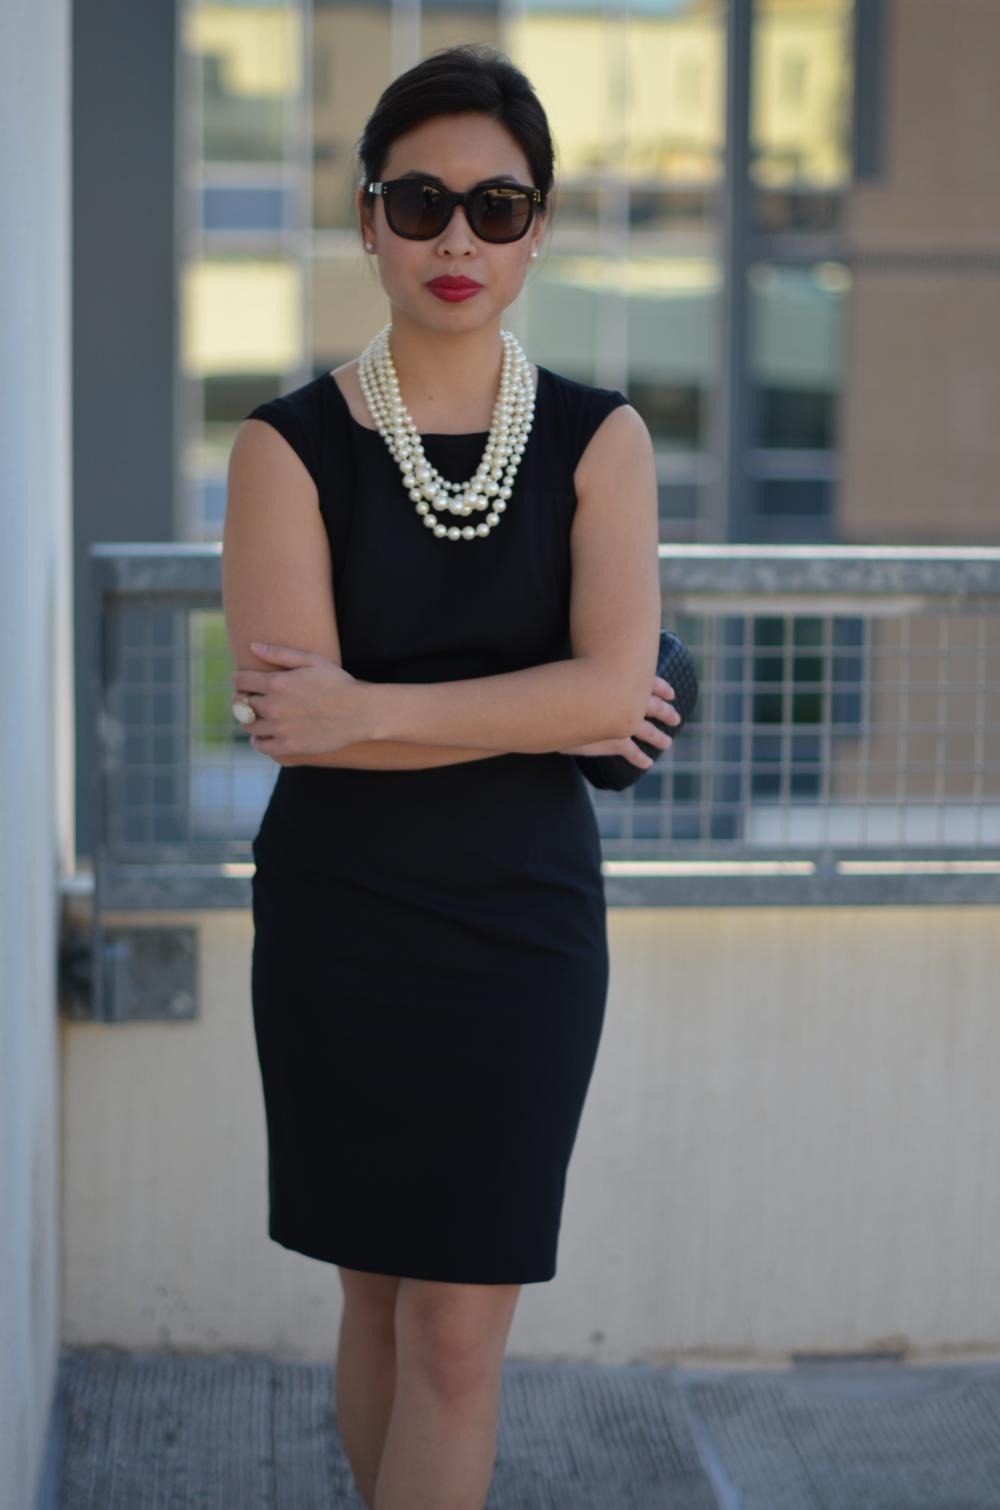 The Little Black Dress Amp Pearls Janna Doan